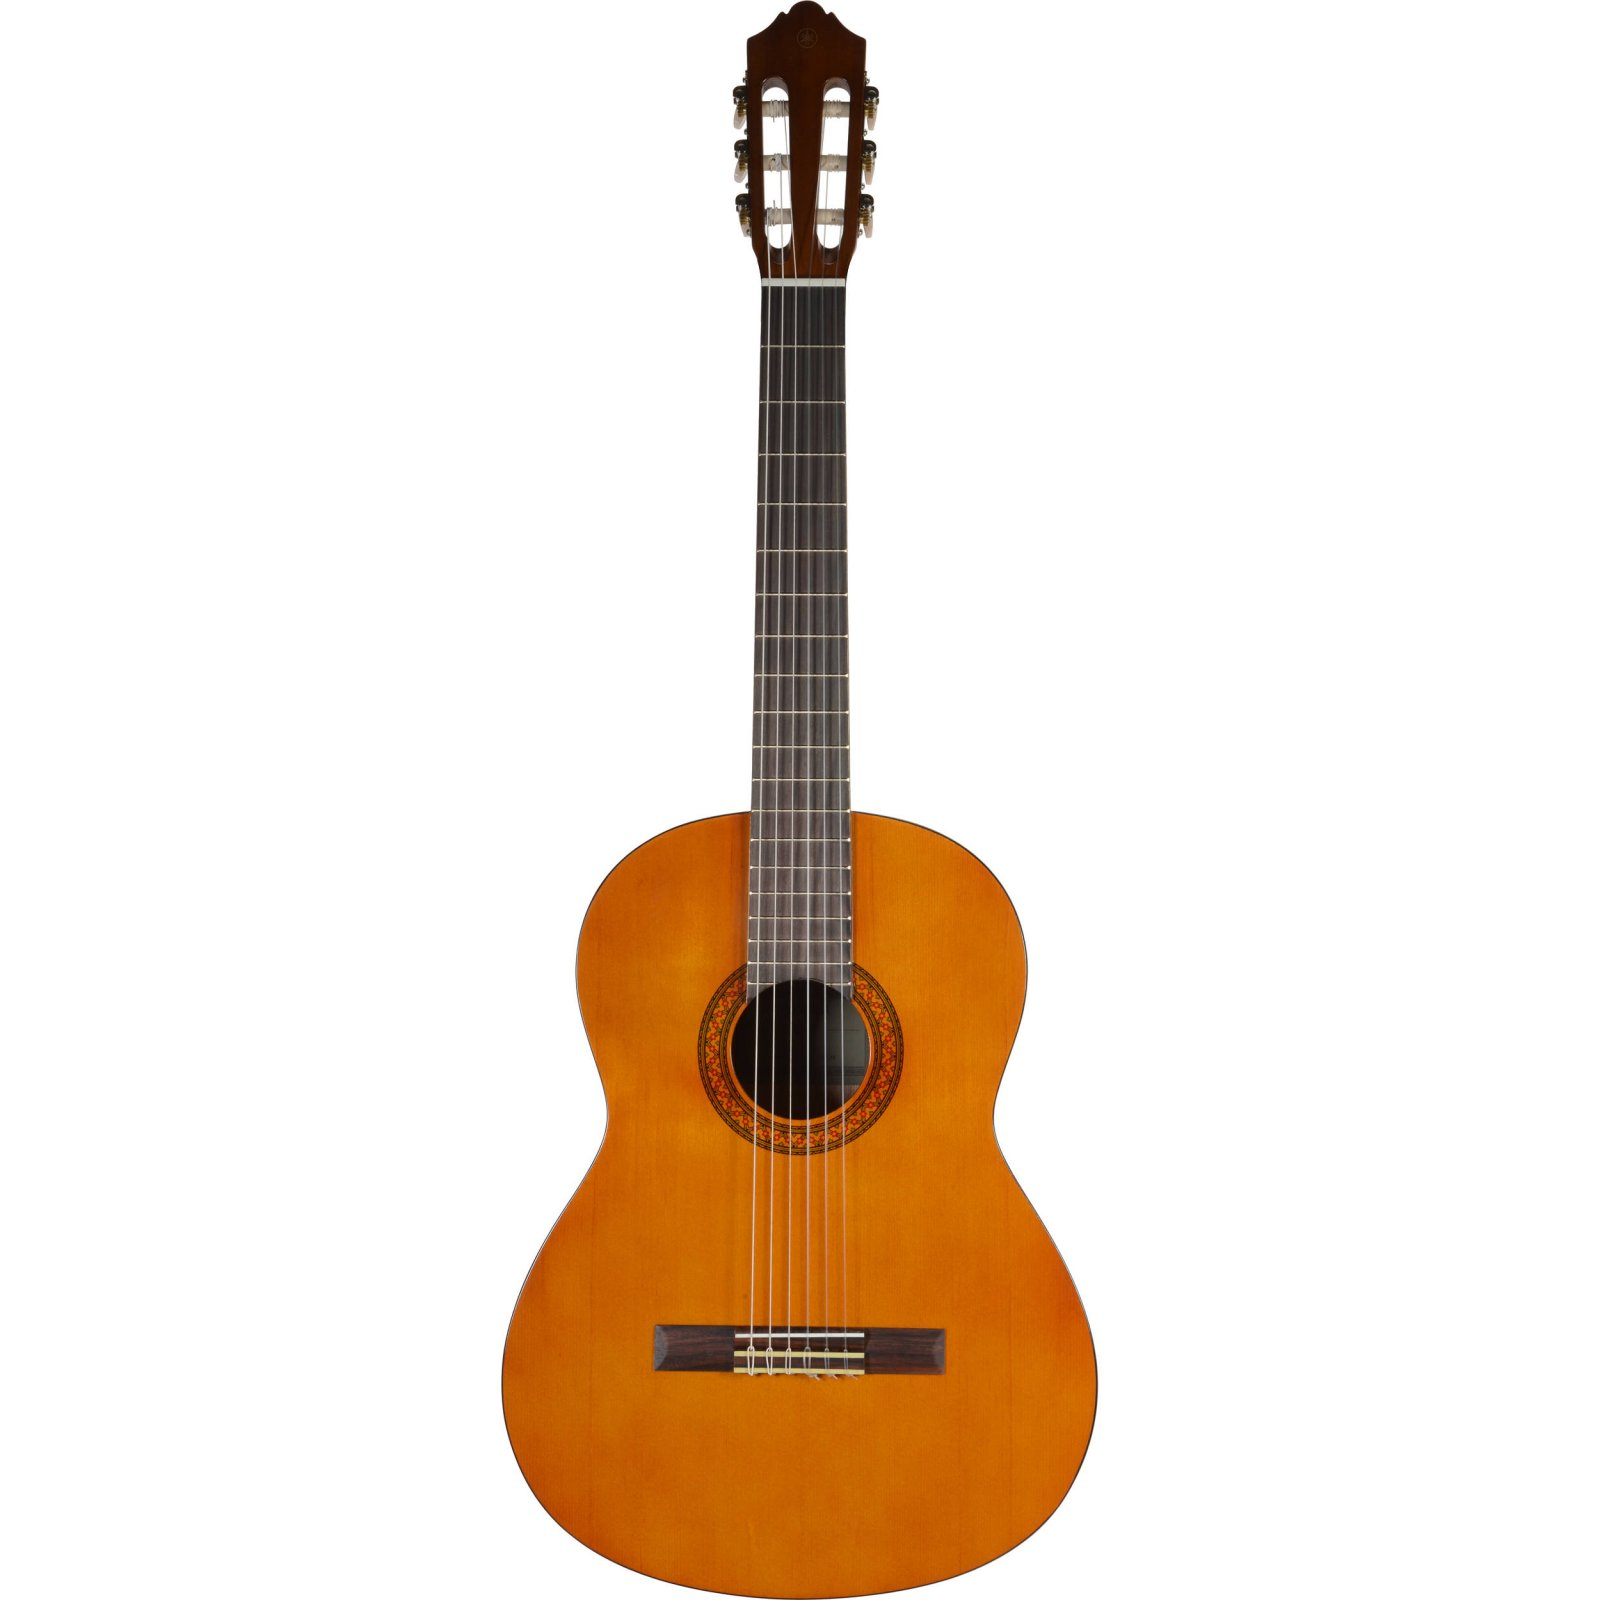 Yamaha C40 Classical Style Guitar (USED)